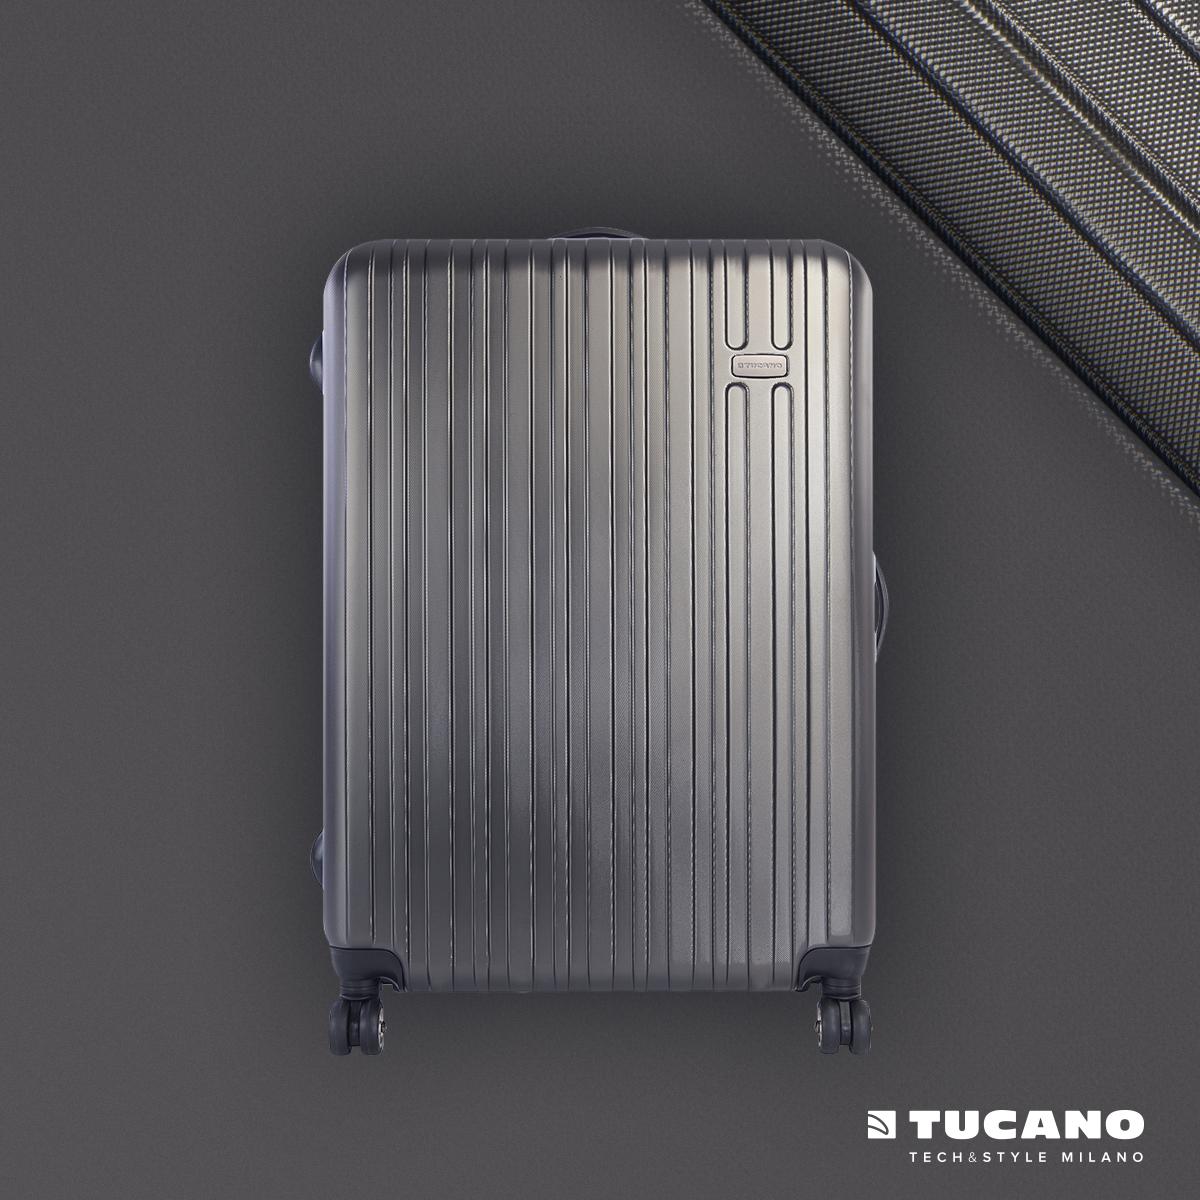 tucano_ago07